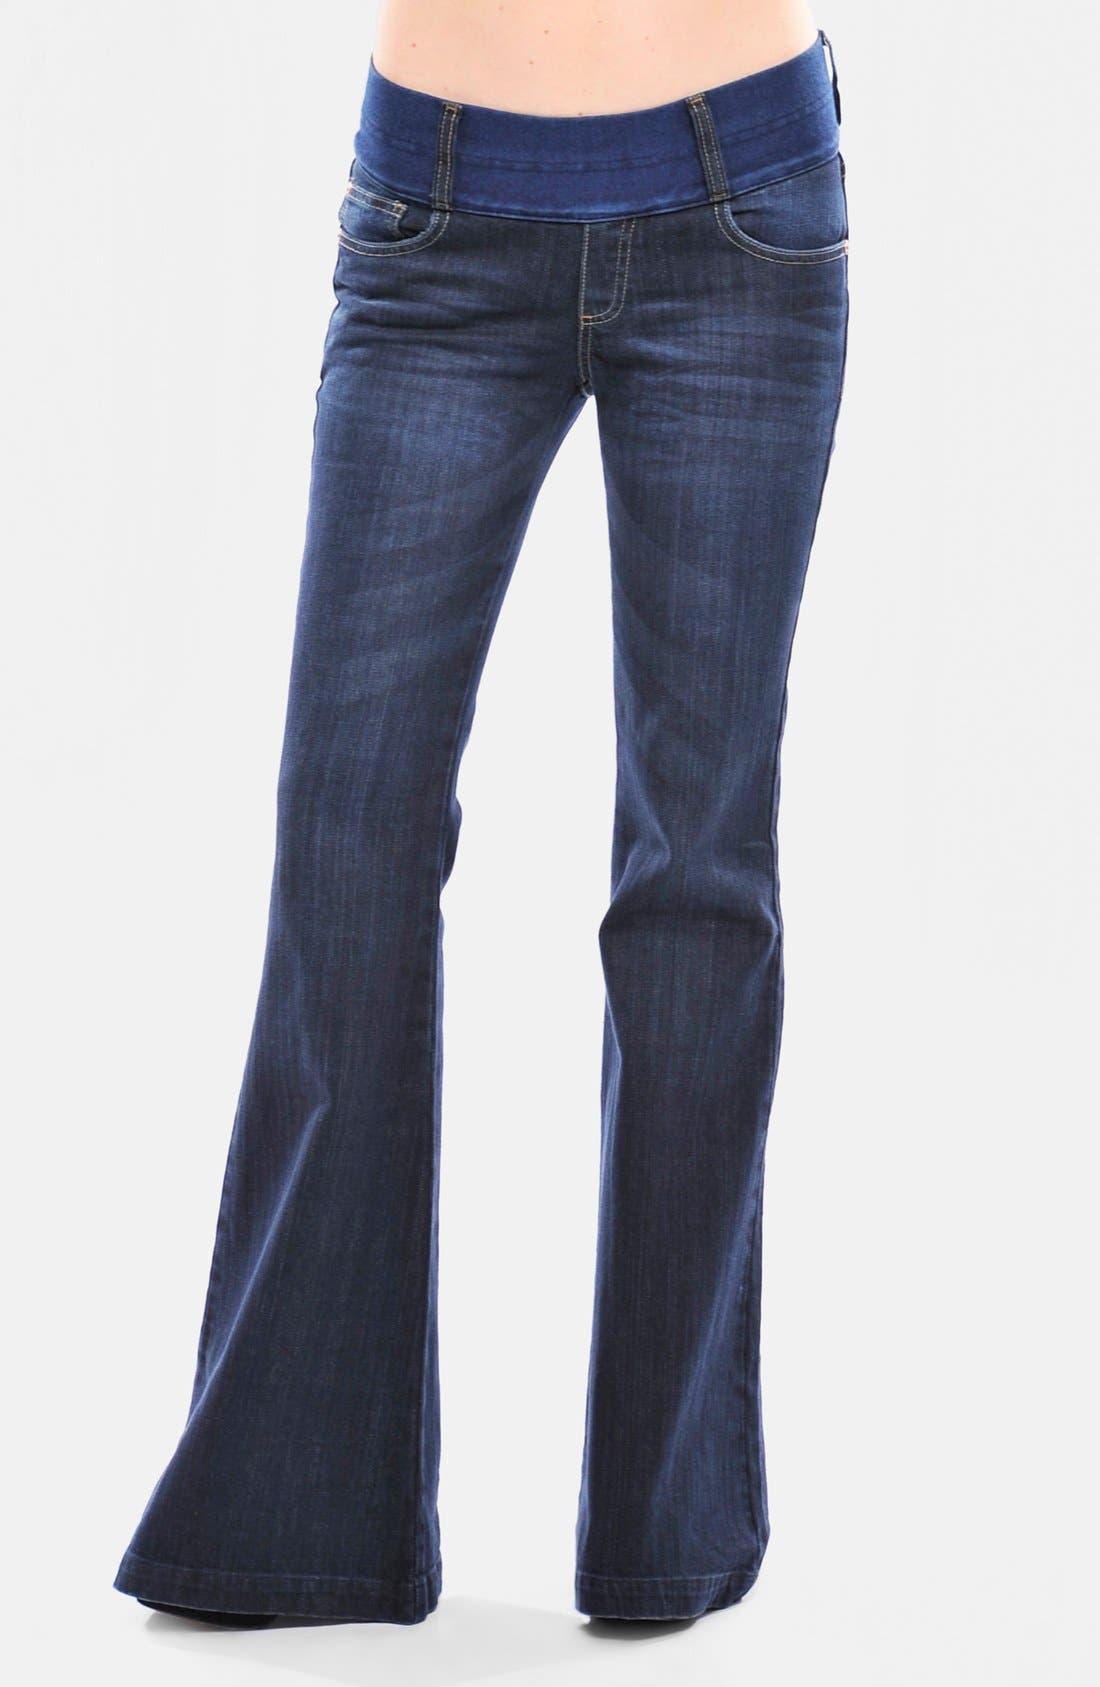 Olian Flare Maternity Jeans | Nordstrom